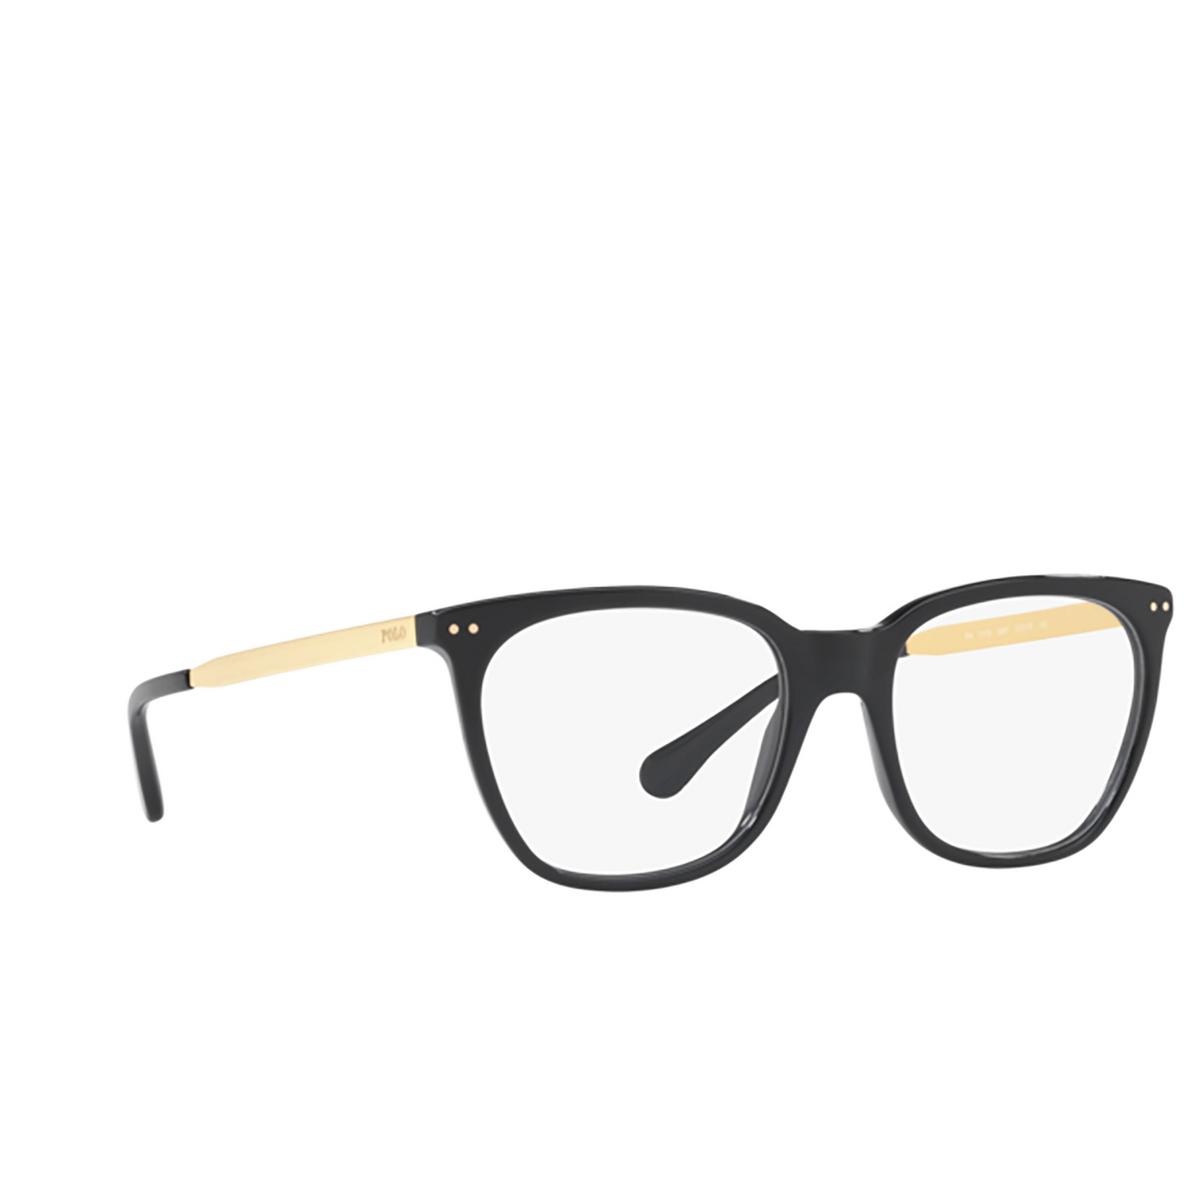 Polo Ralph Lauren® Square Eyeglasses: PH2170 color 5001.